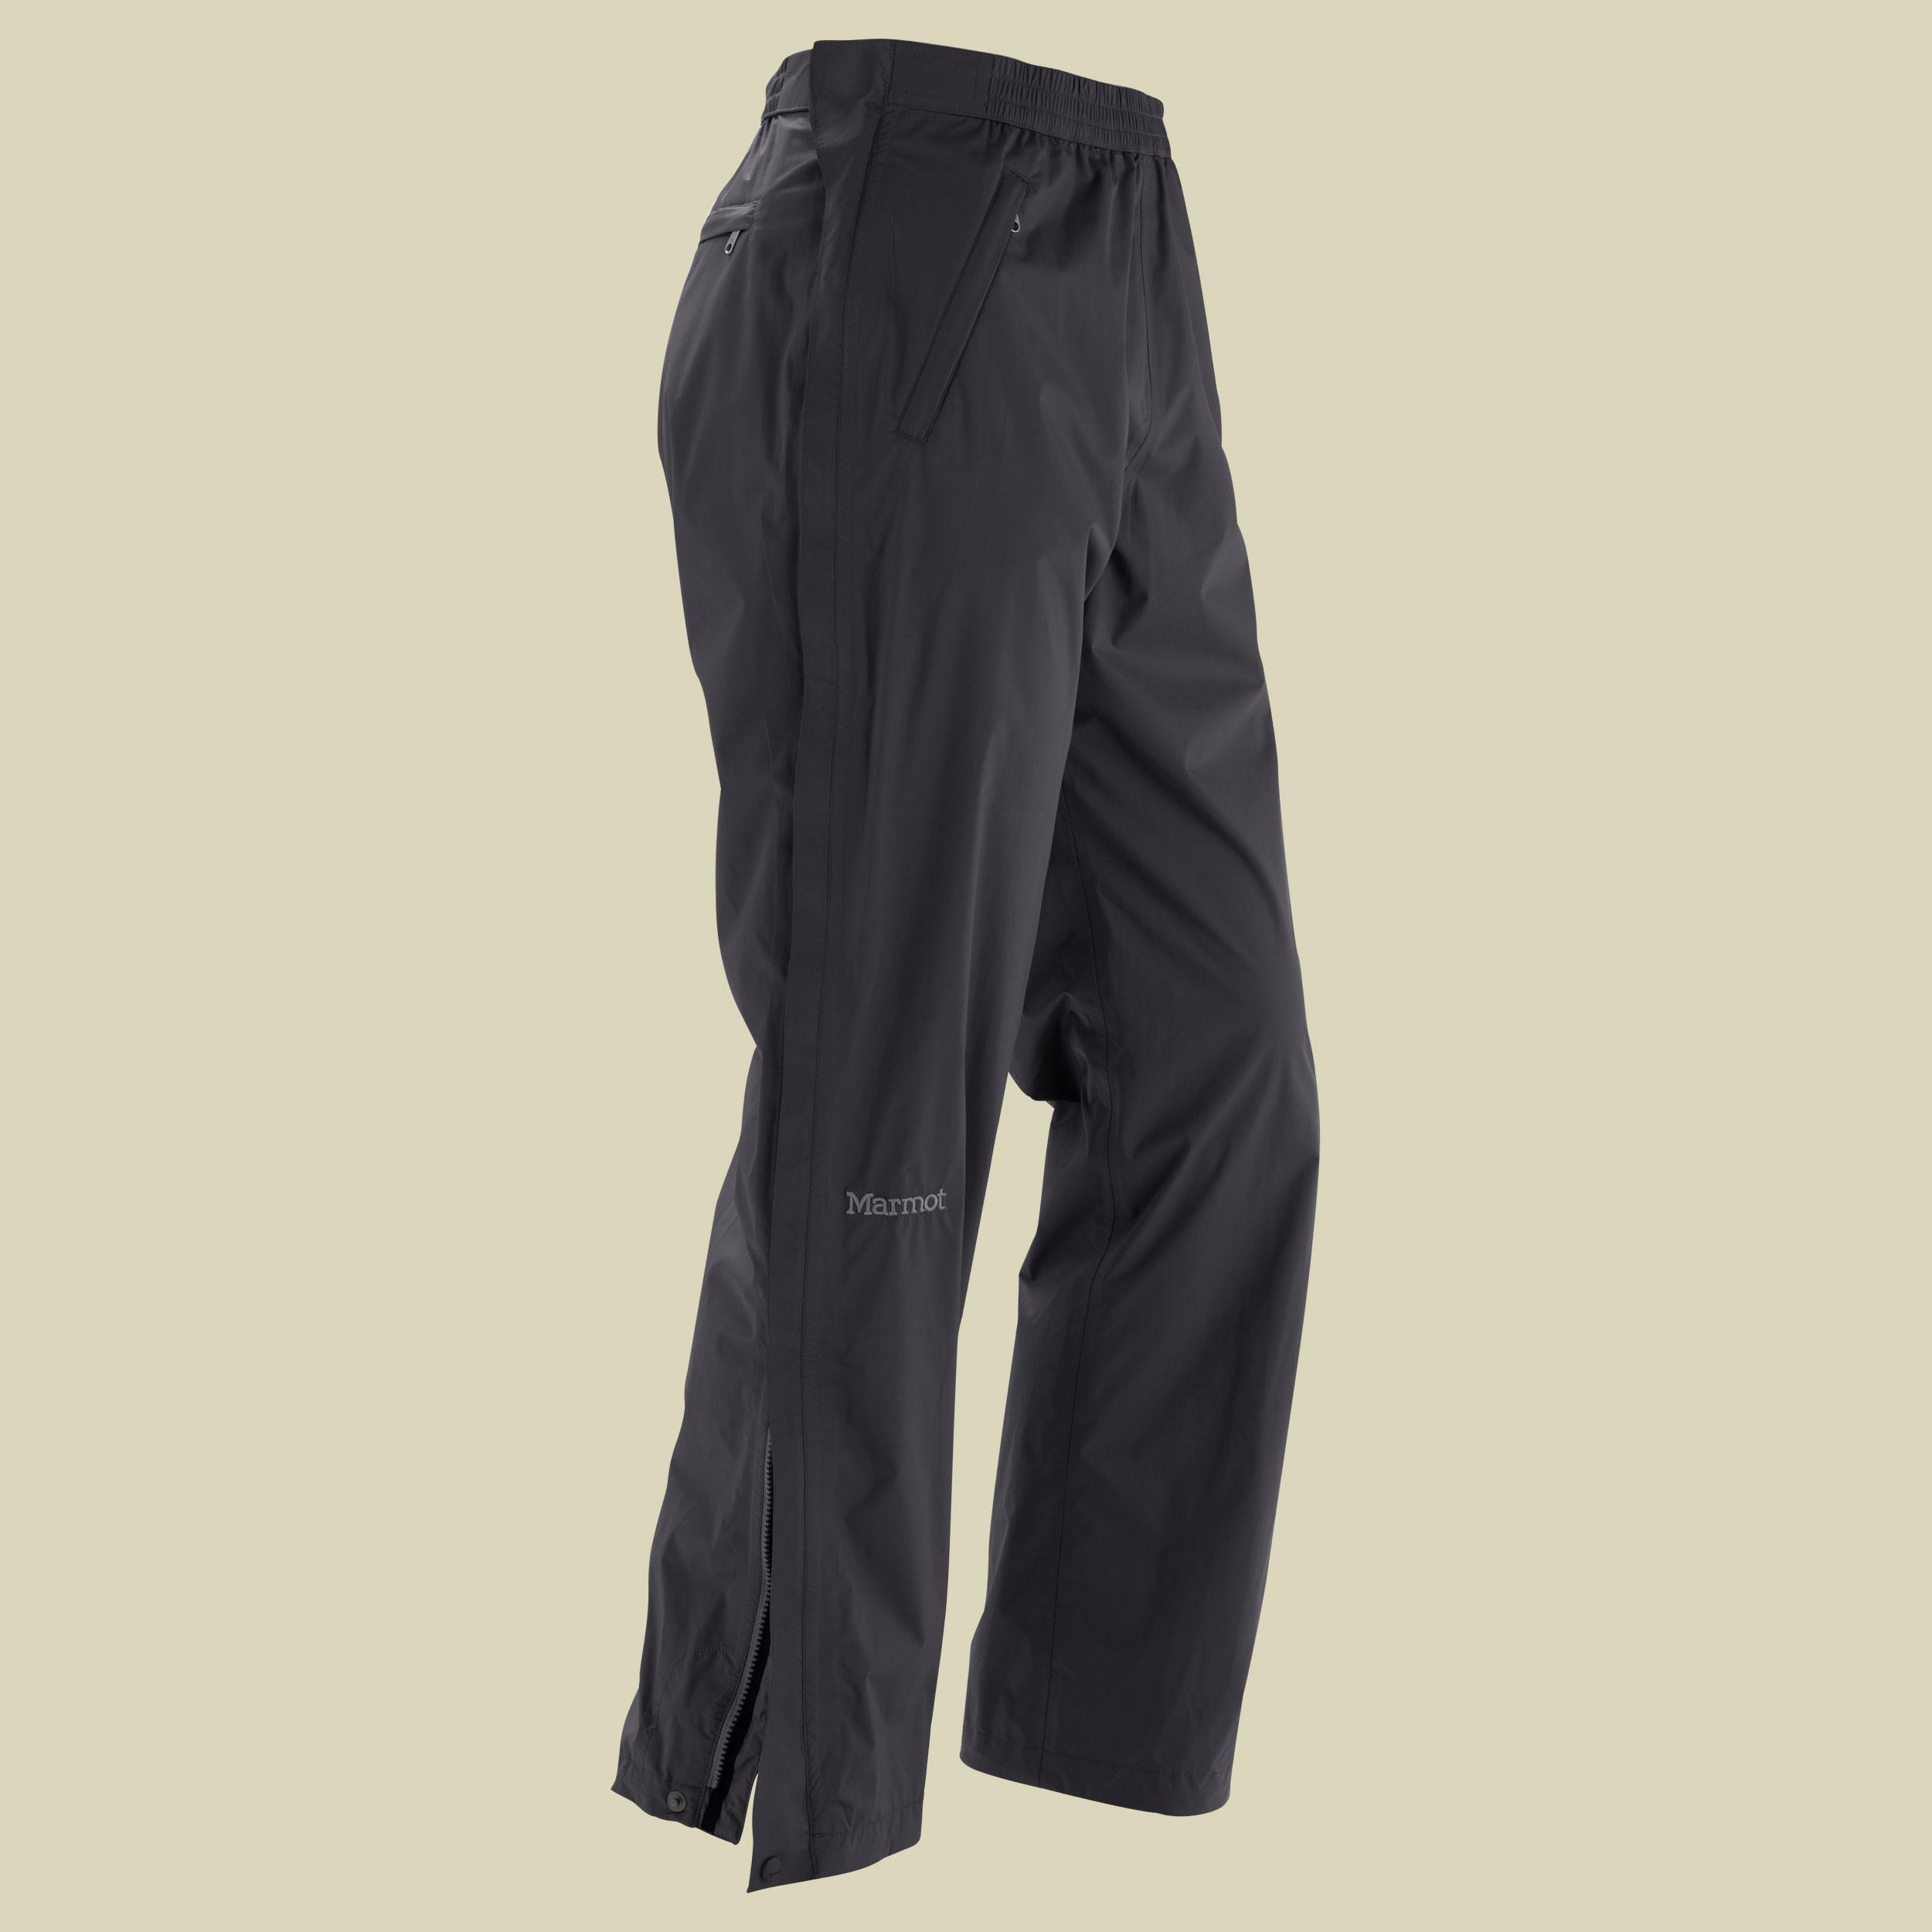 PreCip Full Zip Pant short Men